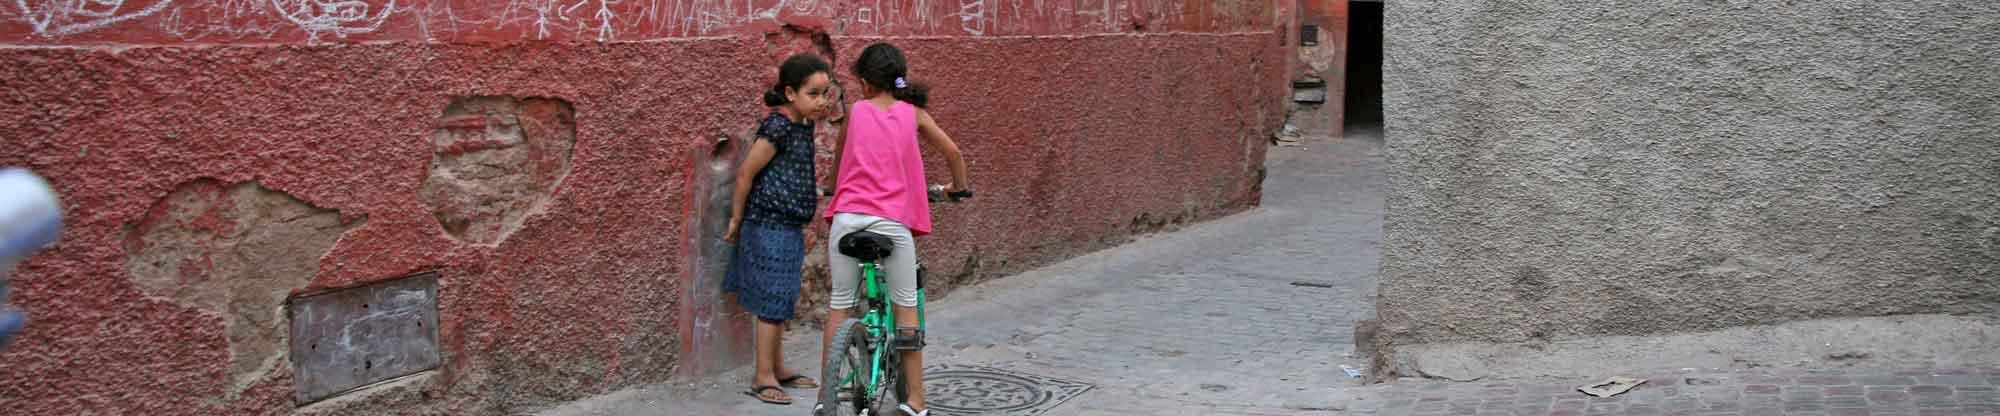 marokko-gassen-kinder